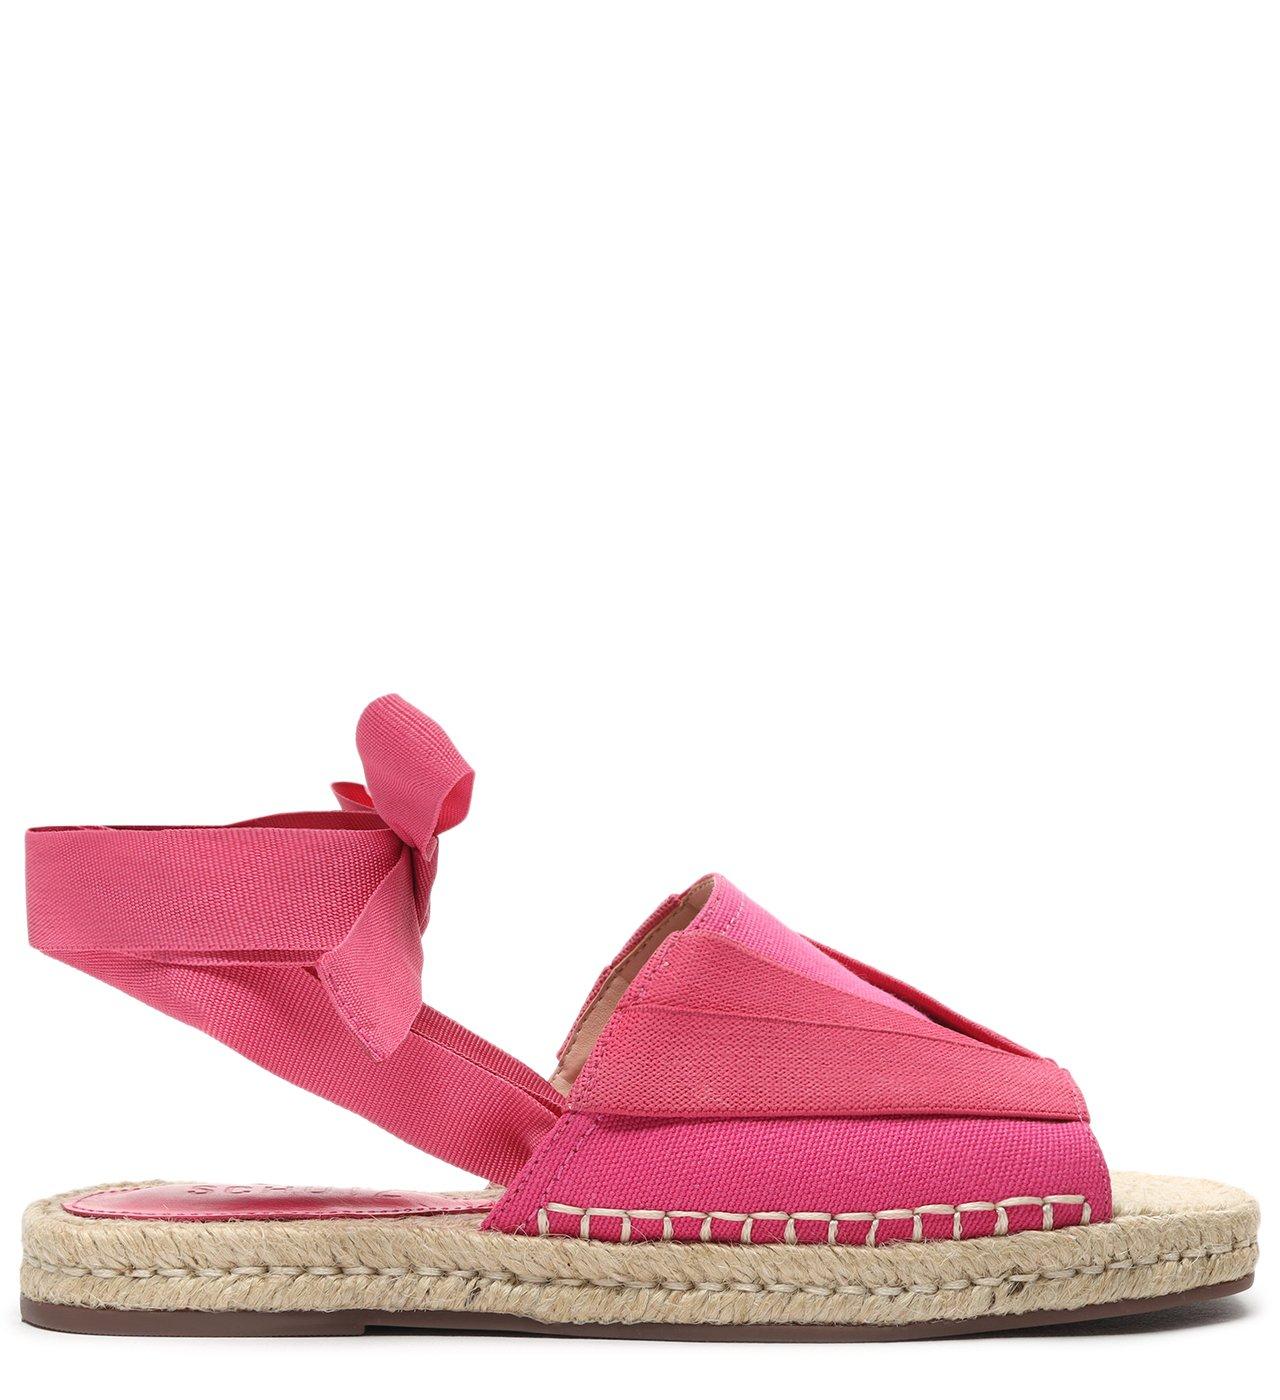 Flat Open Espadrille Pink | Schutz